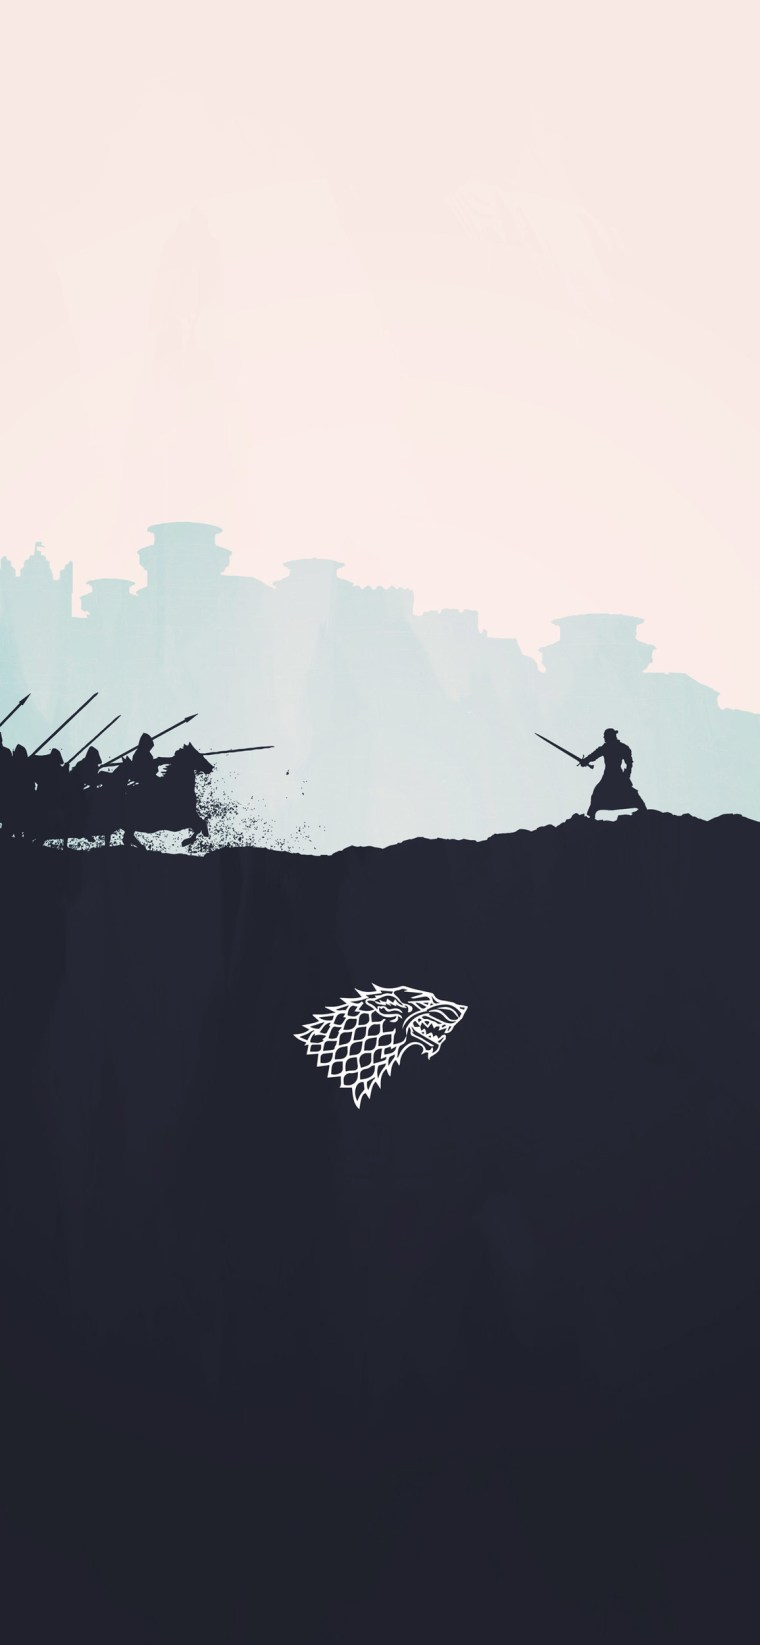 jon-snow-minimalism- iPhone game of thrones wallpaper